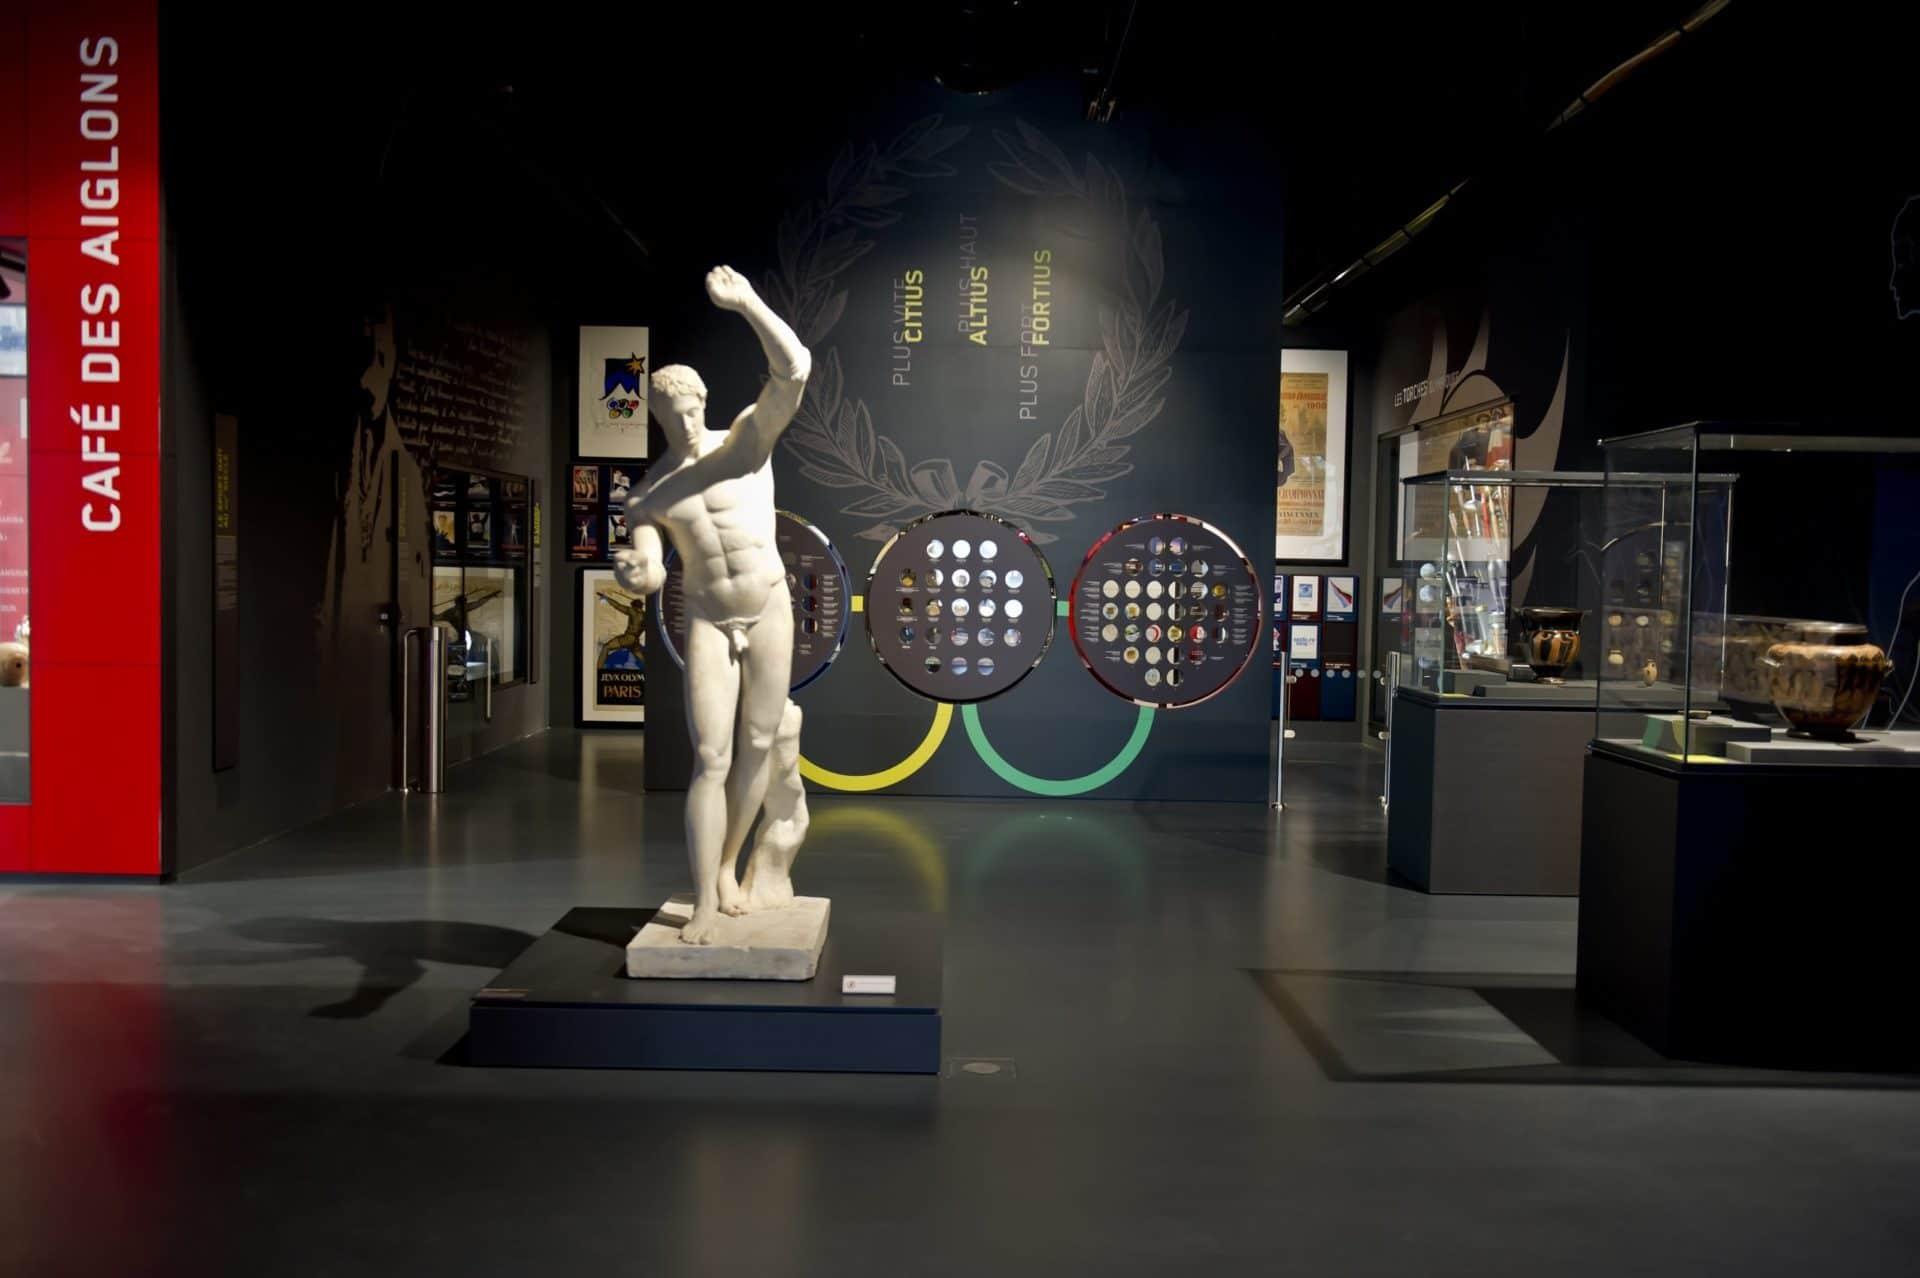 Exposition du musée national du sport